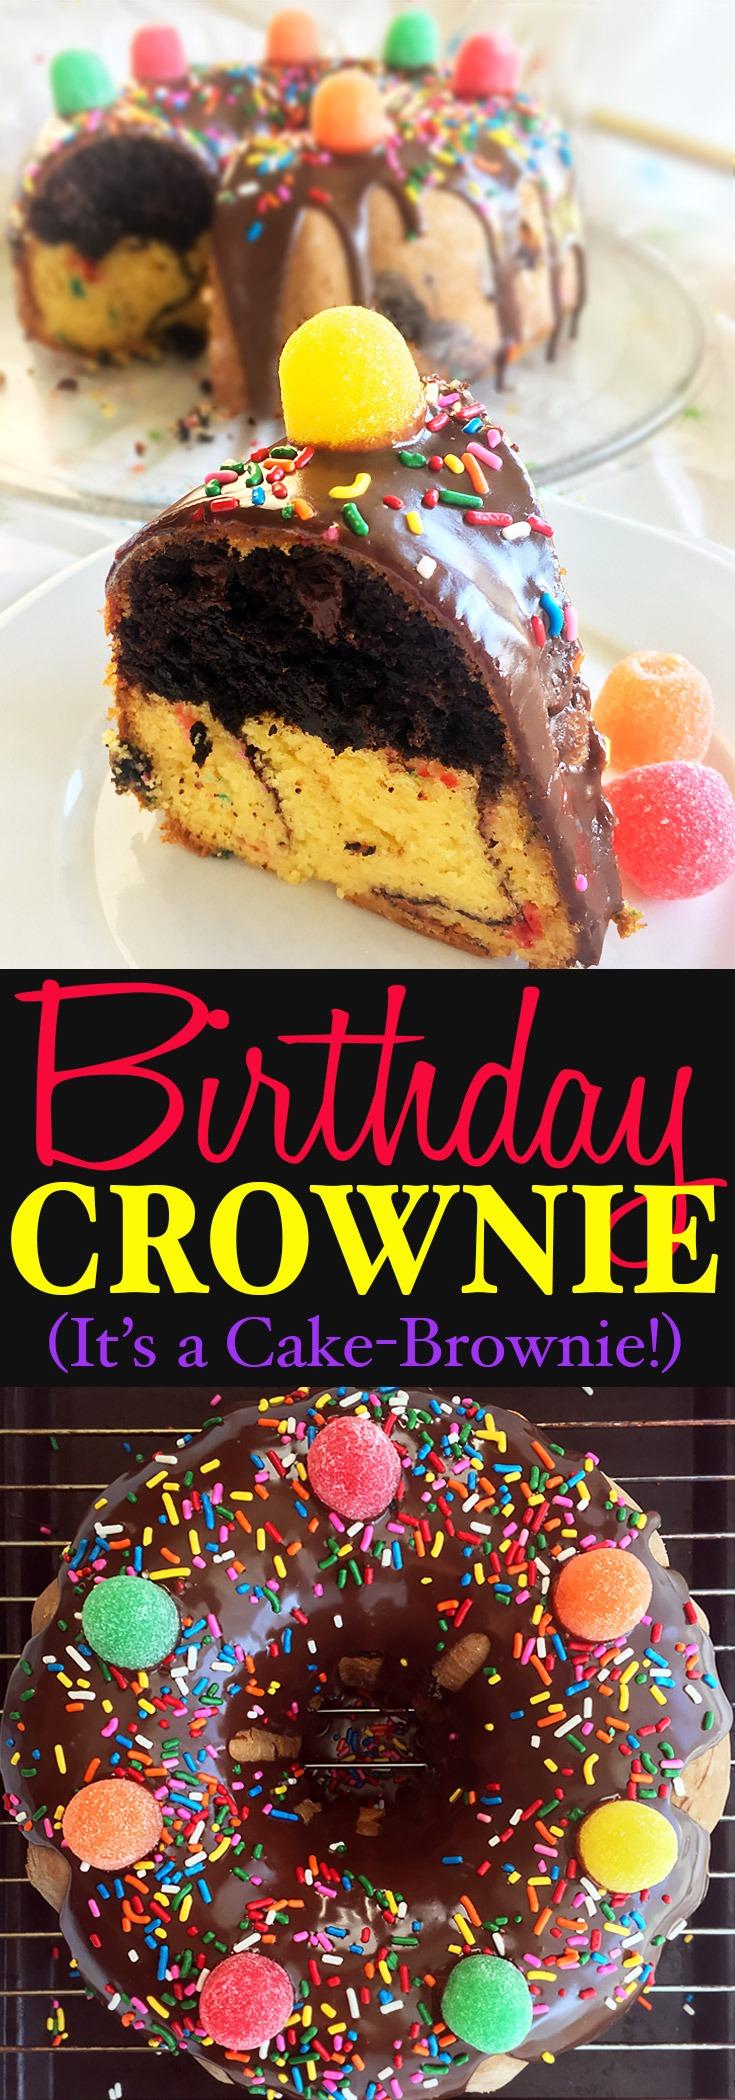 Birthday Crownie It S A Cake Brownie Cherry And Spice